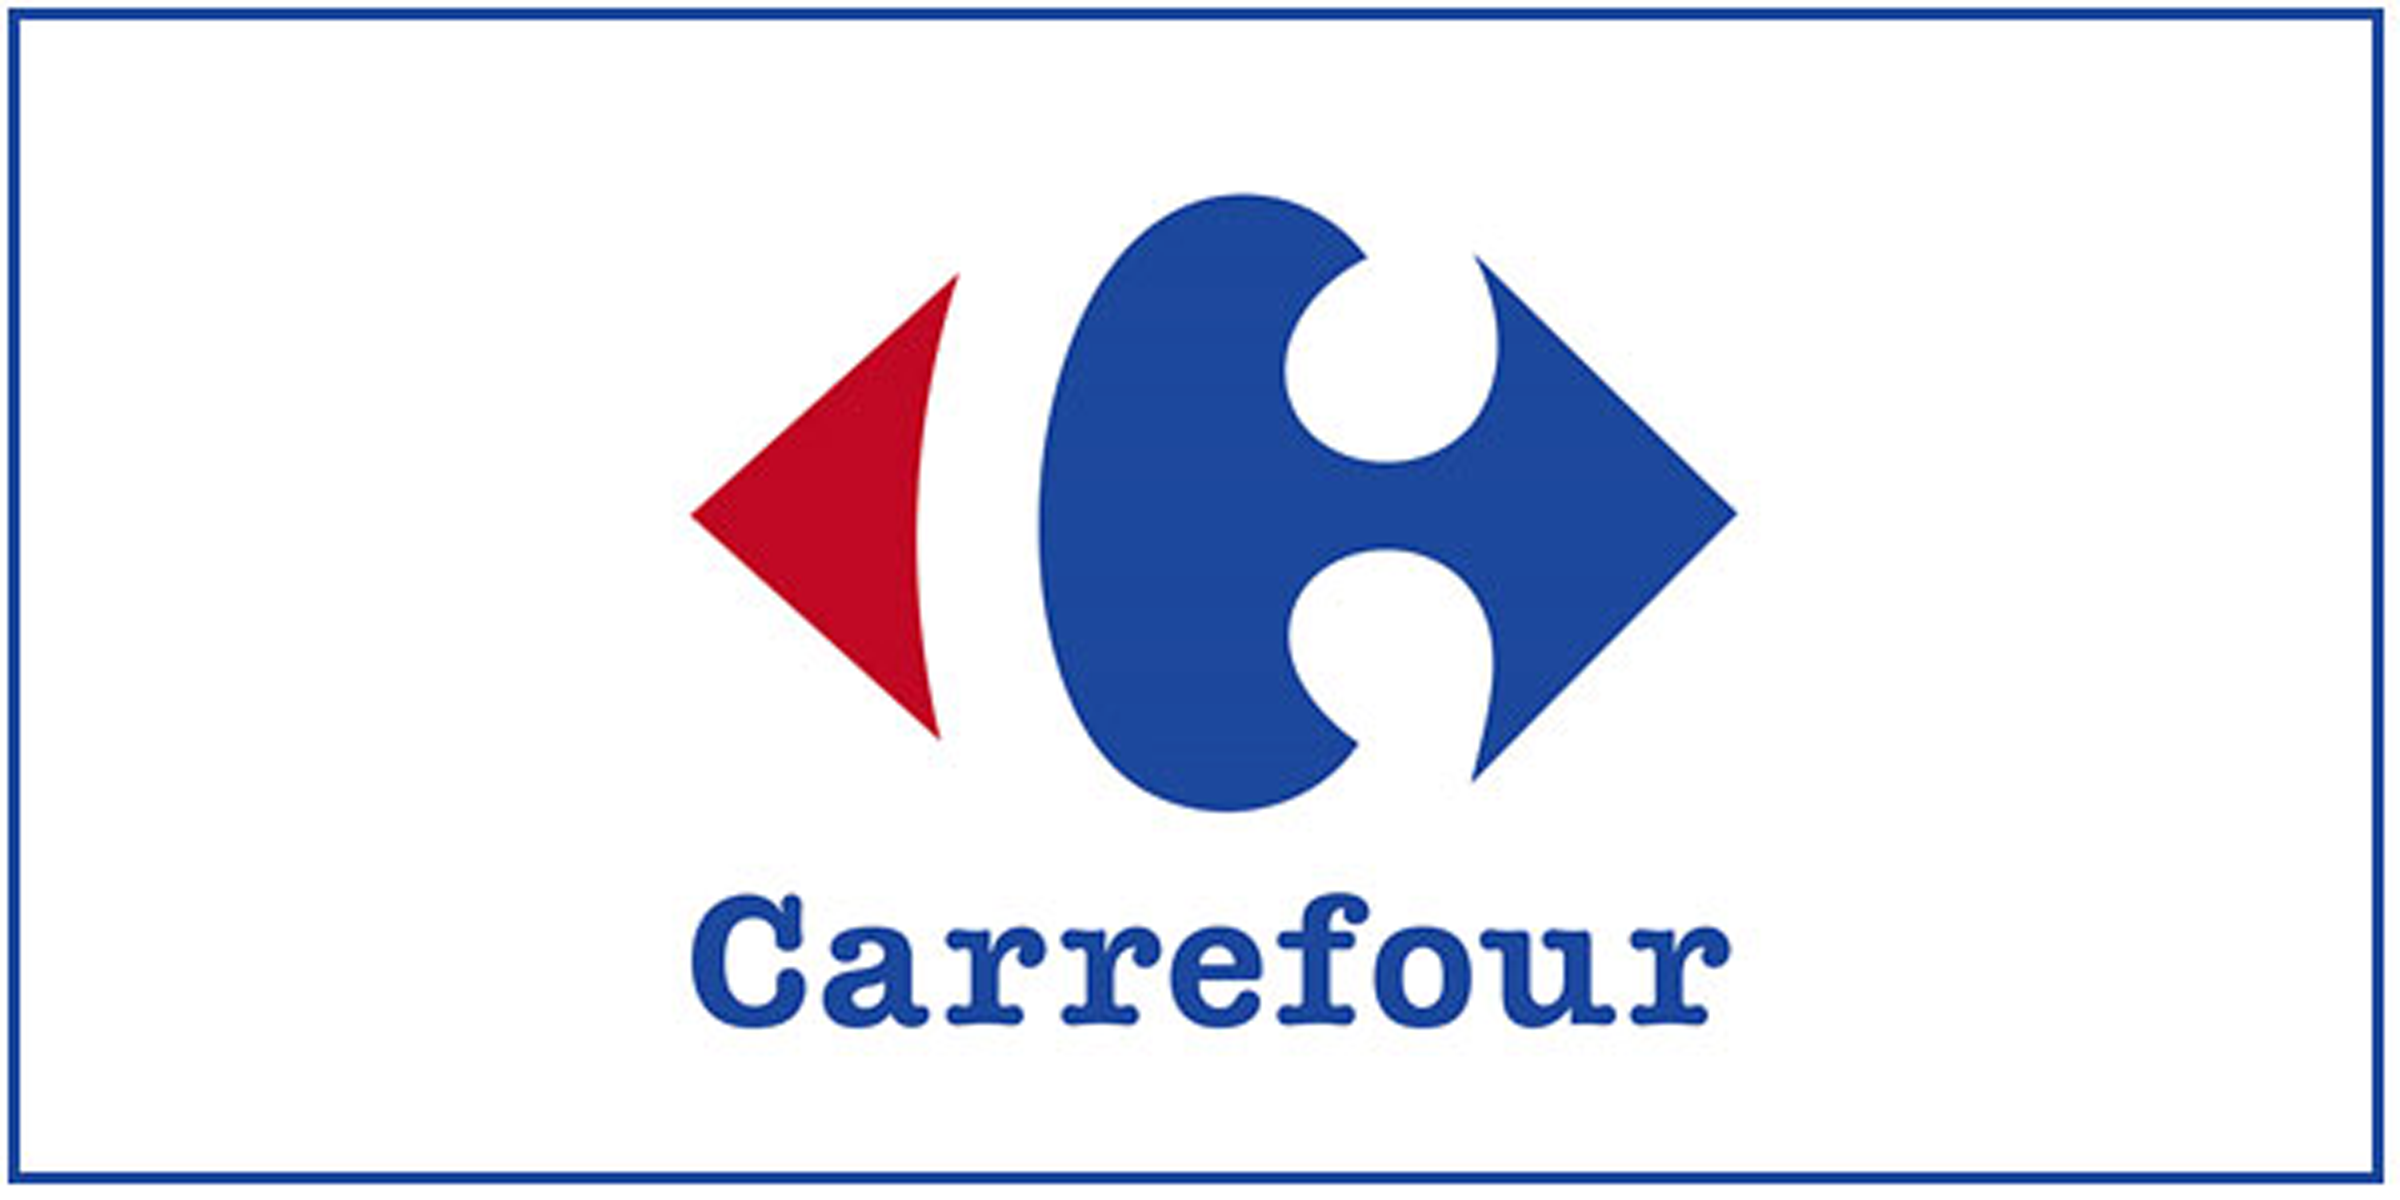 https://www.carrefour.es/telefonia/cat4155009/c